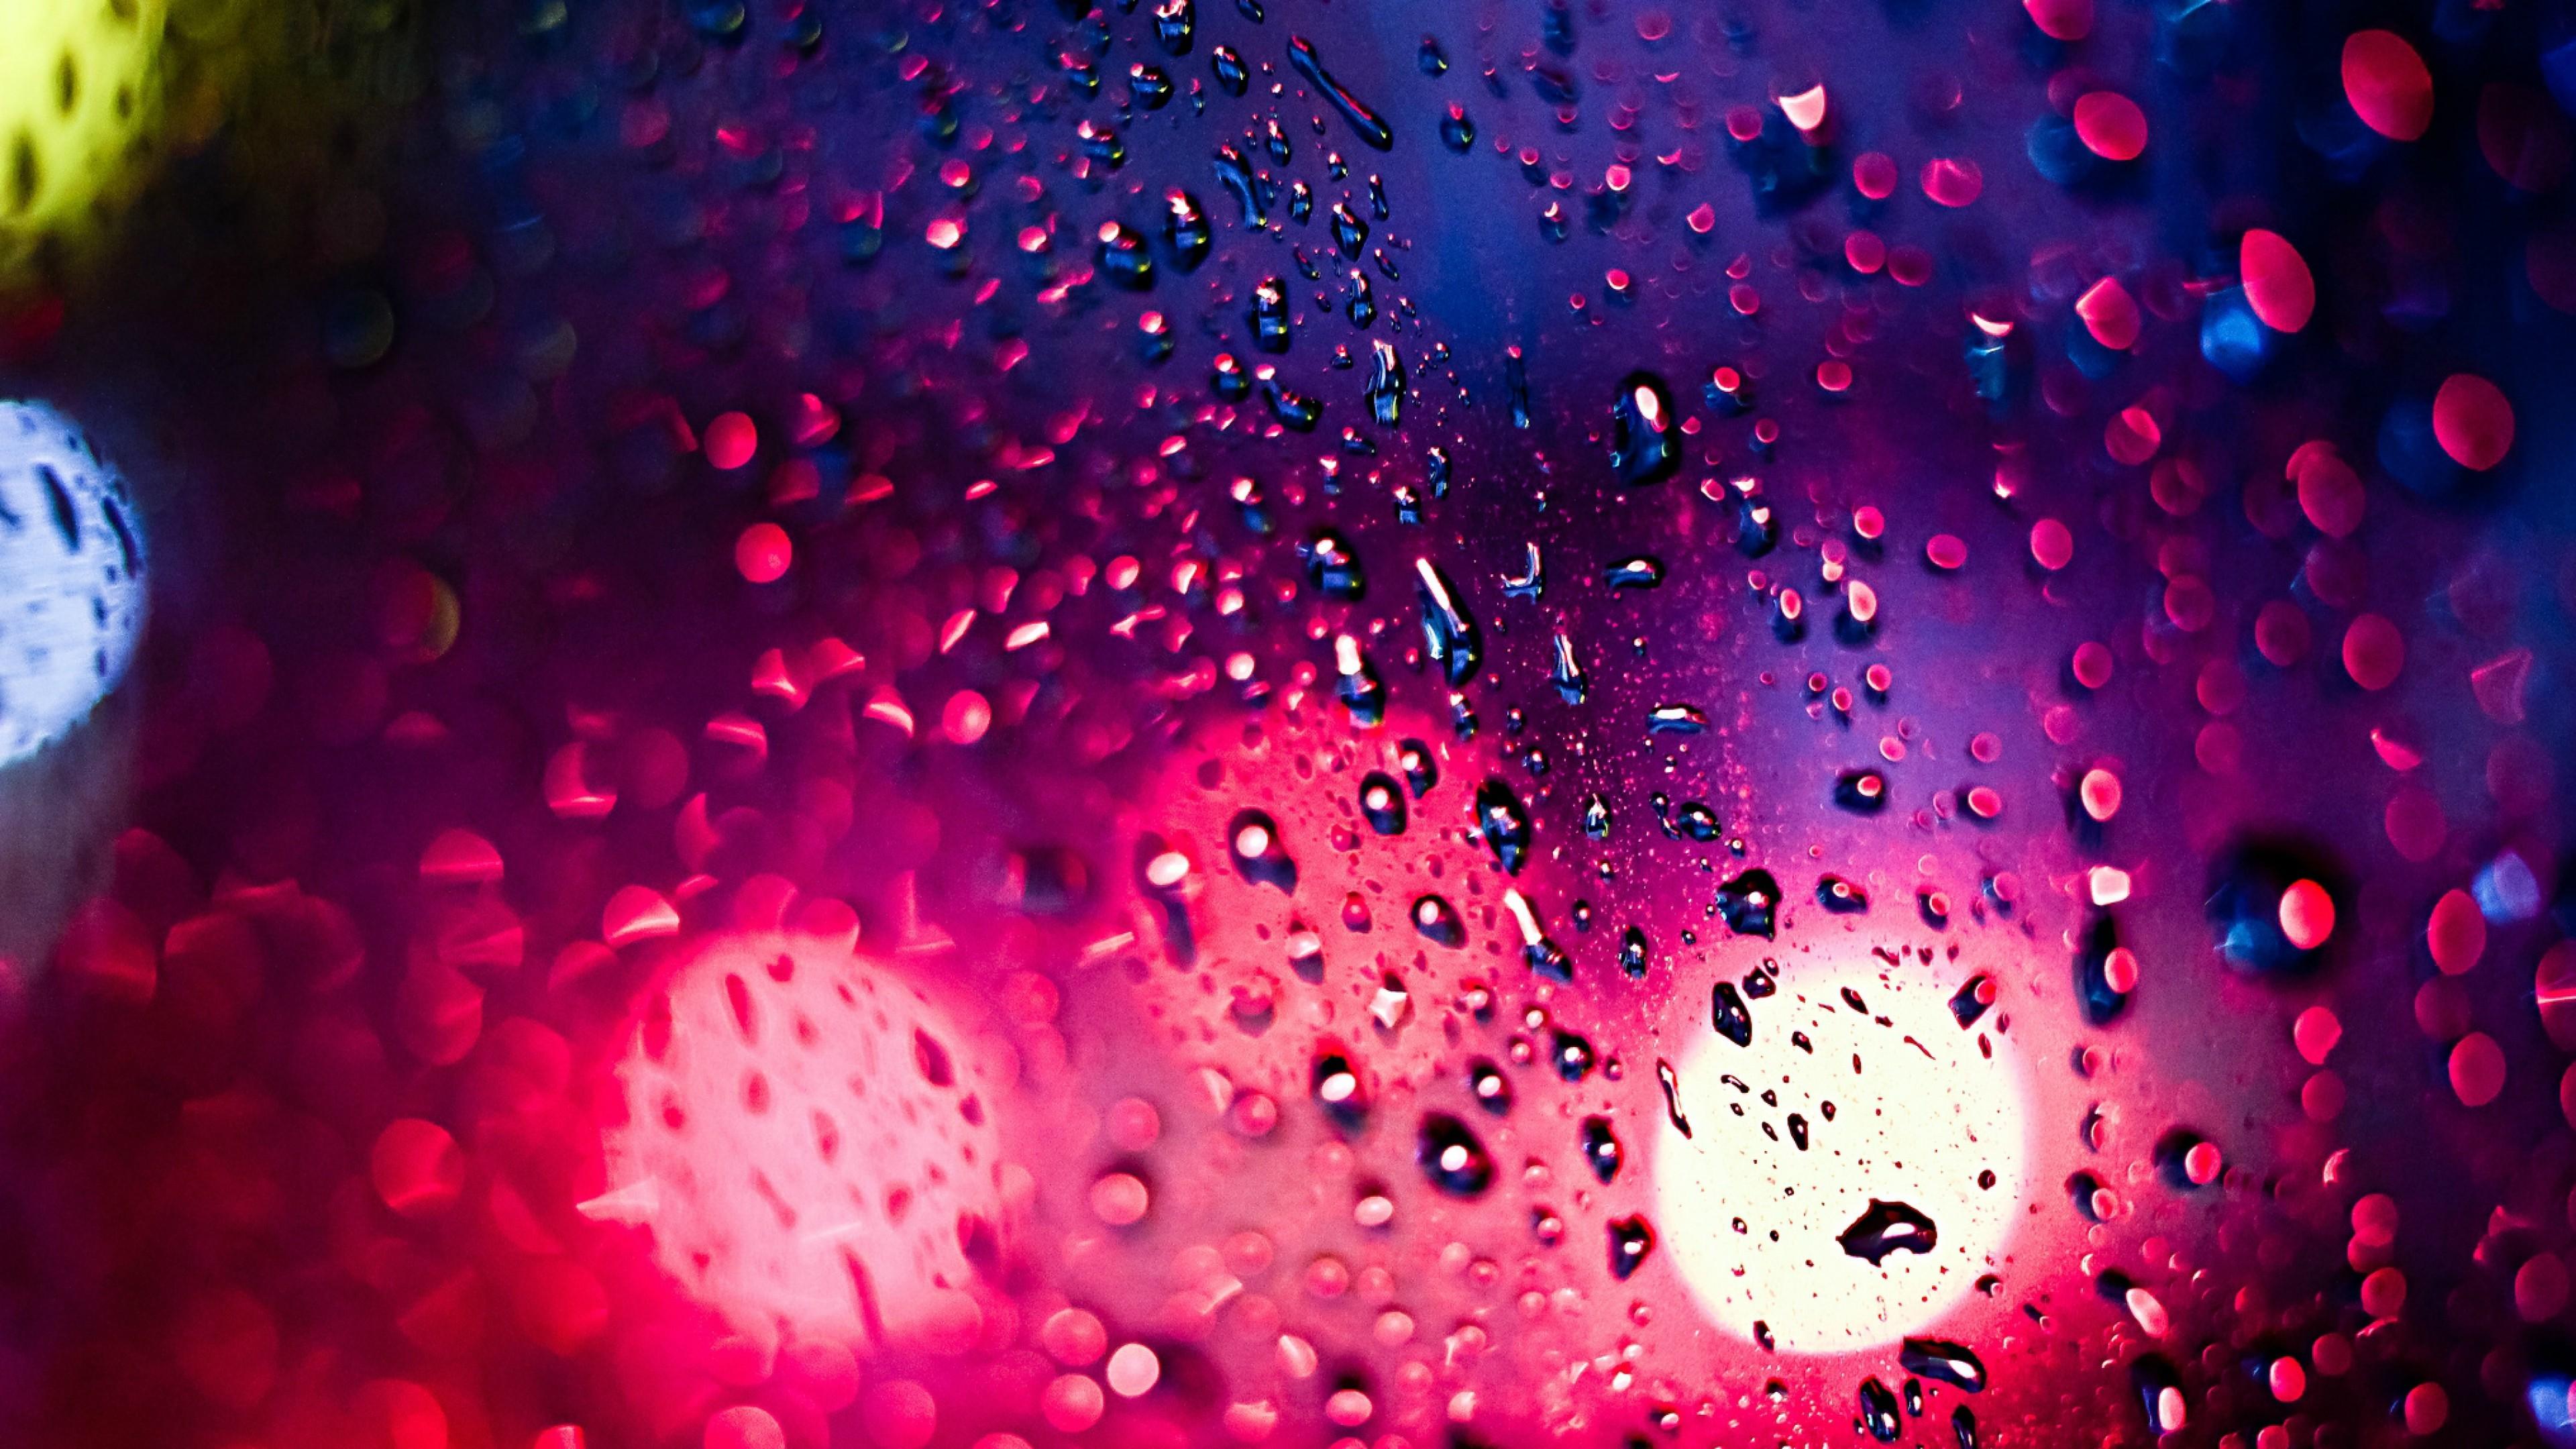 Wallpaper : Window, Night, Red, Water Drops, Glass, Circle